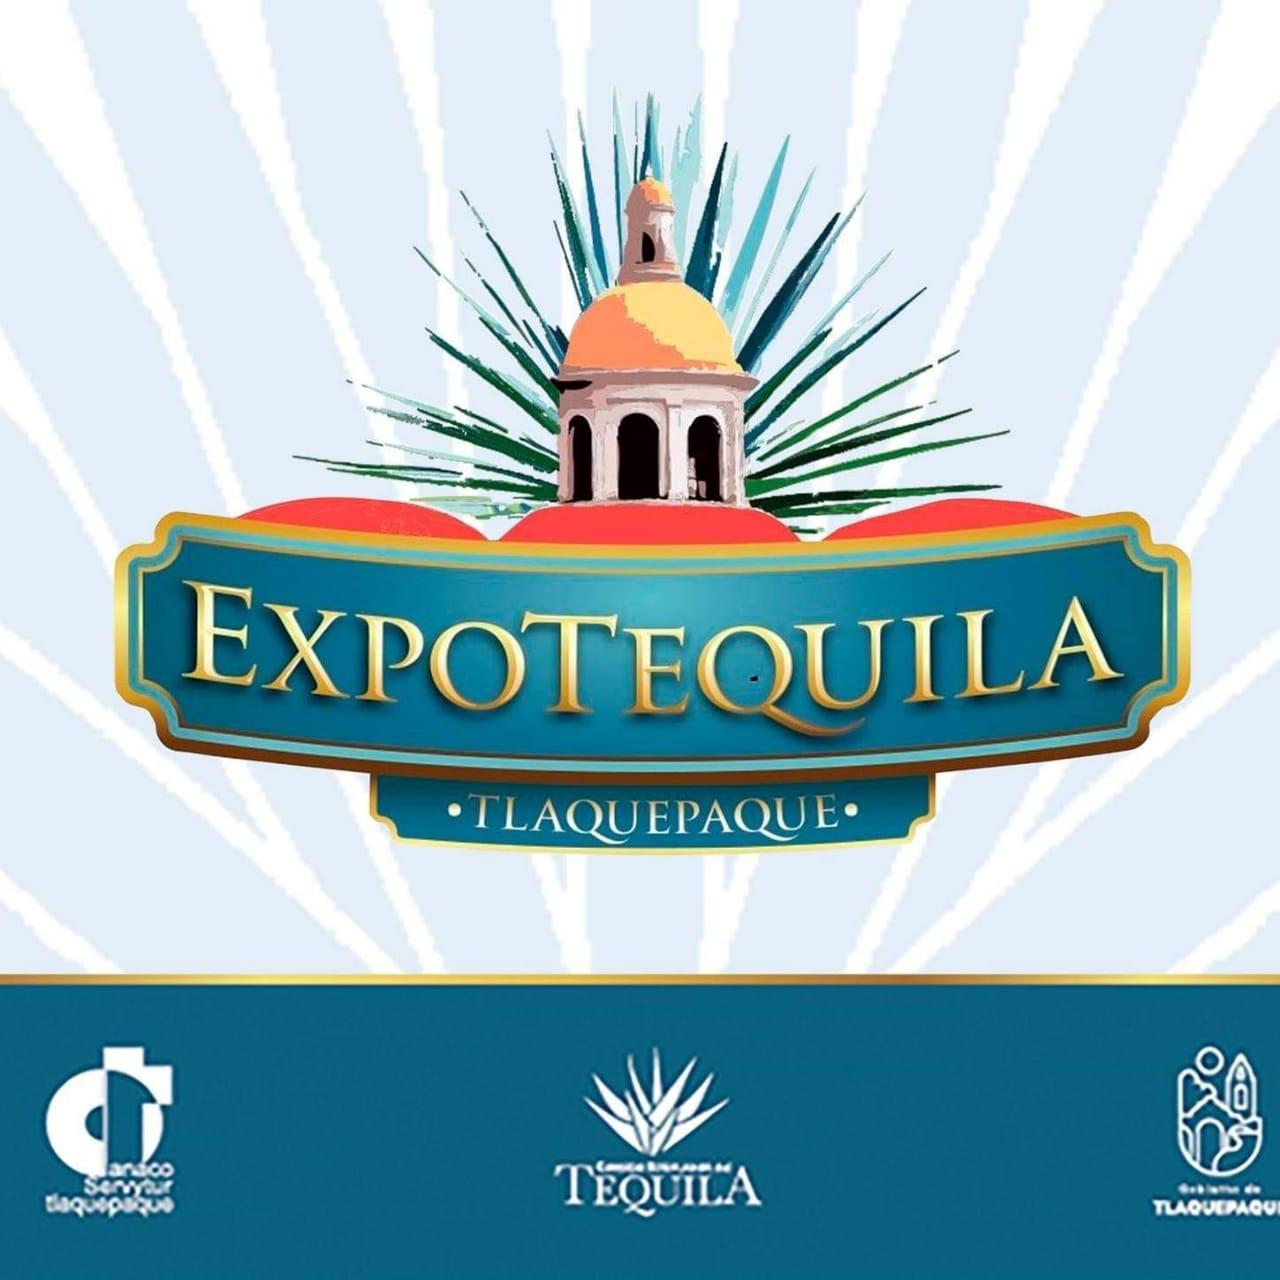 IX Expo Tequila Tlaquepaque 2019